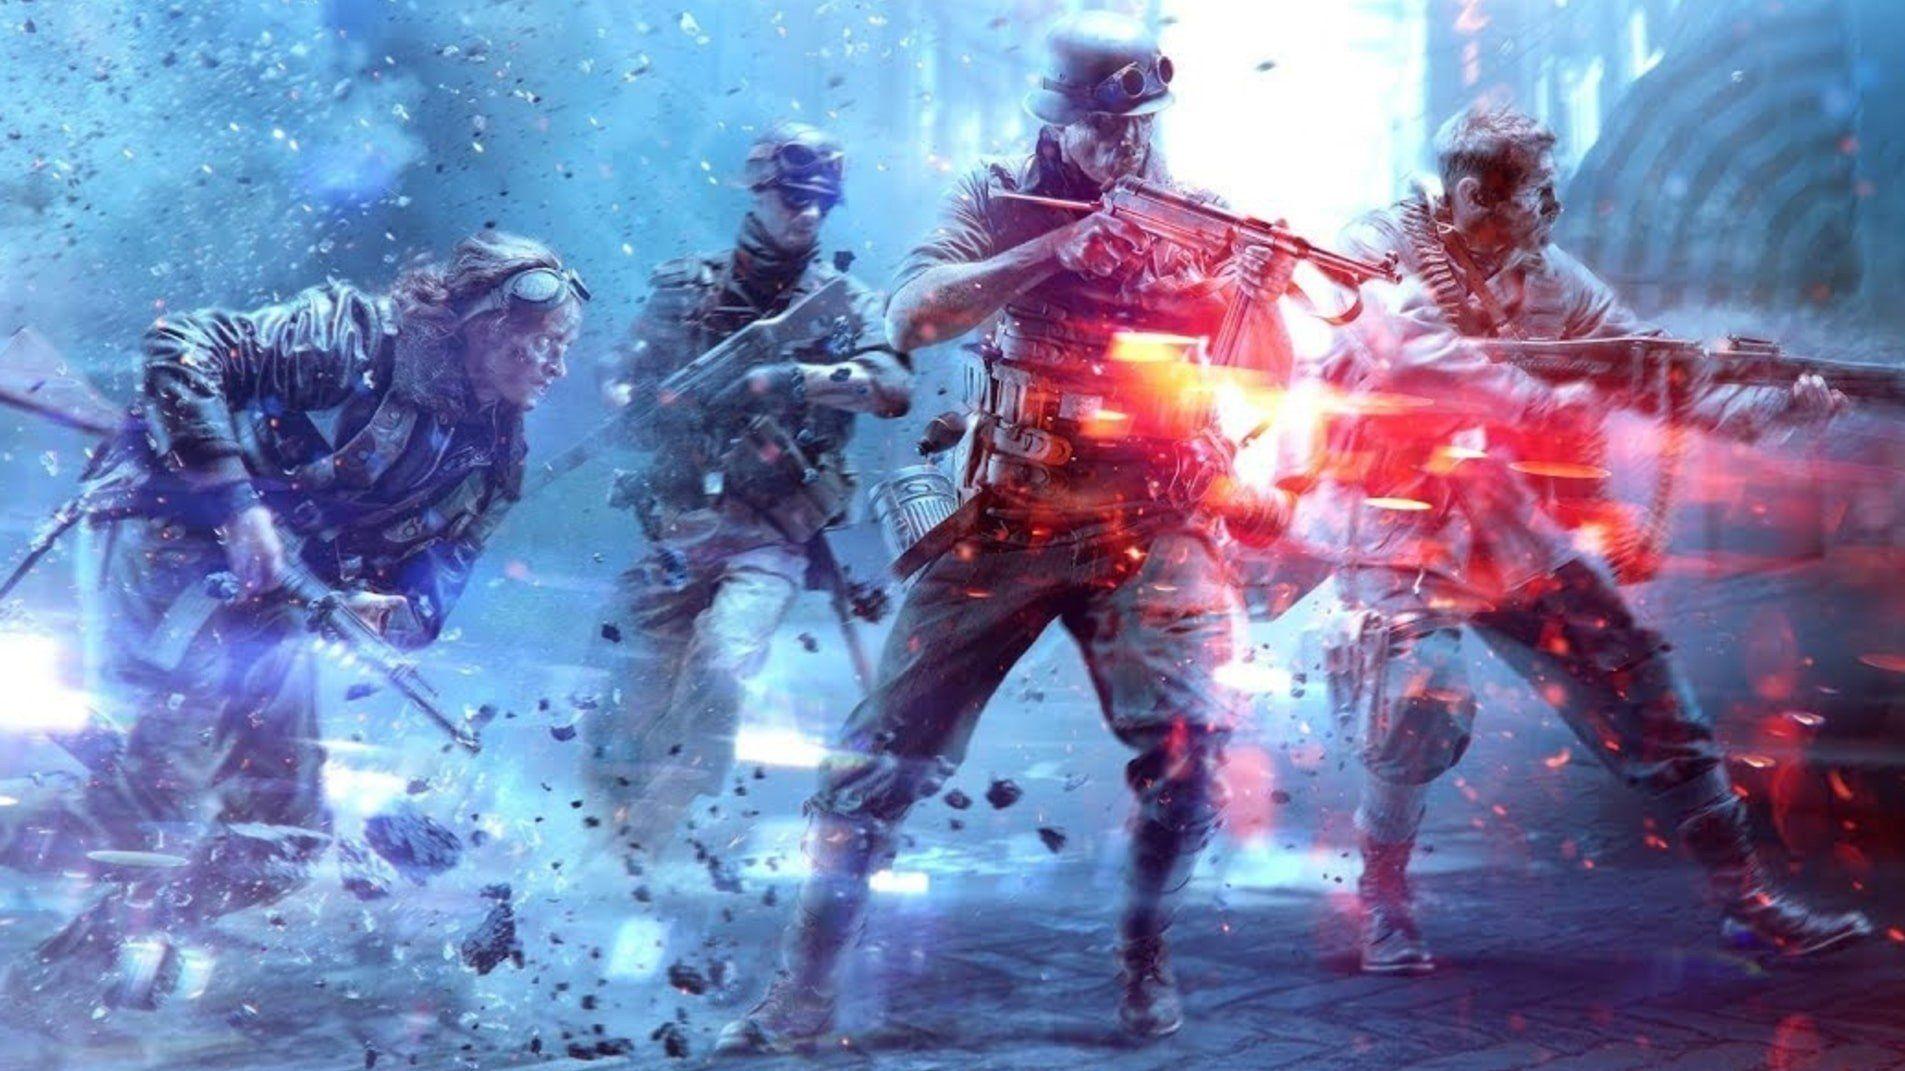 Battlefield 5 Update Teased In New Gameplay Video Released By Ea